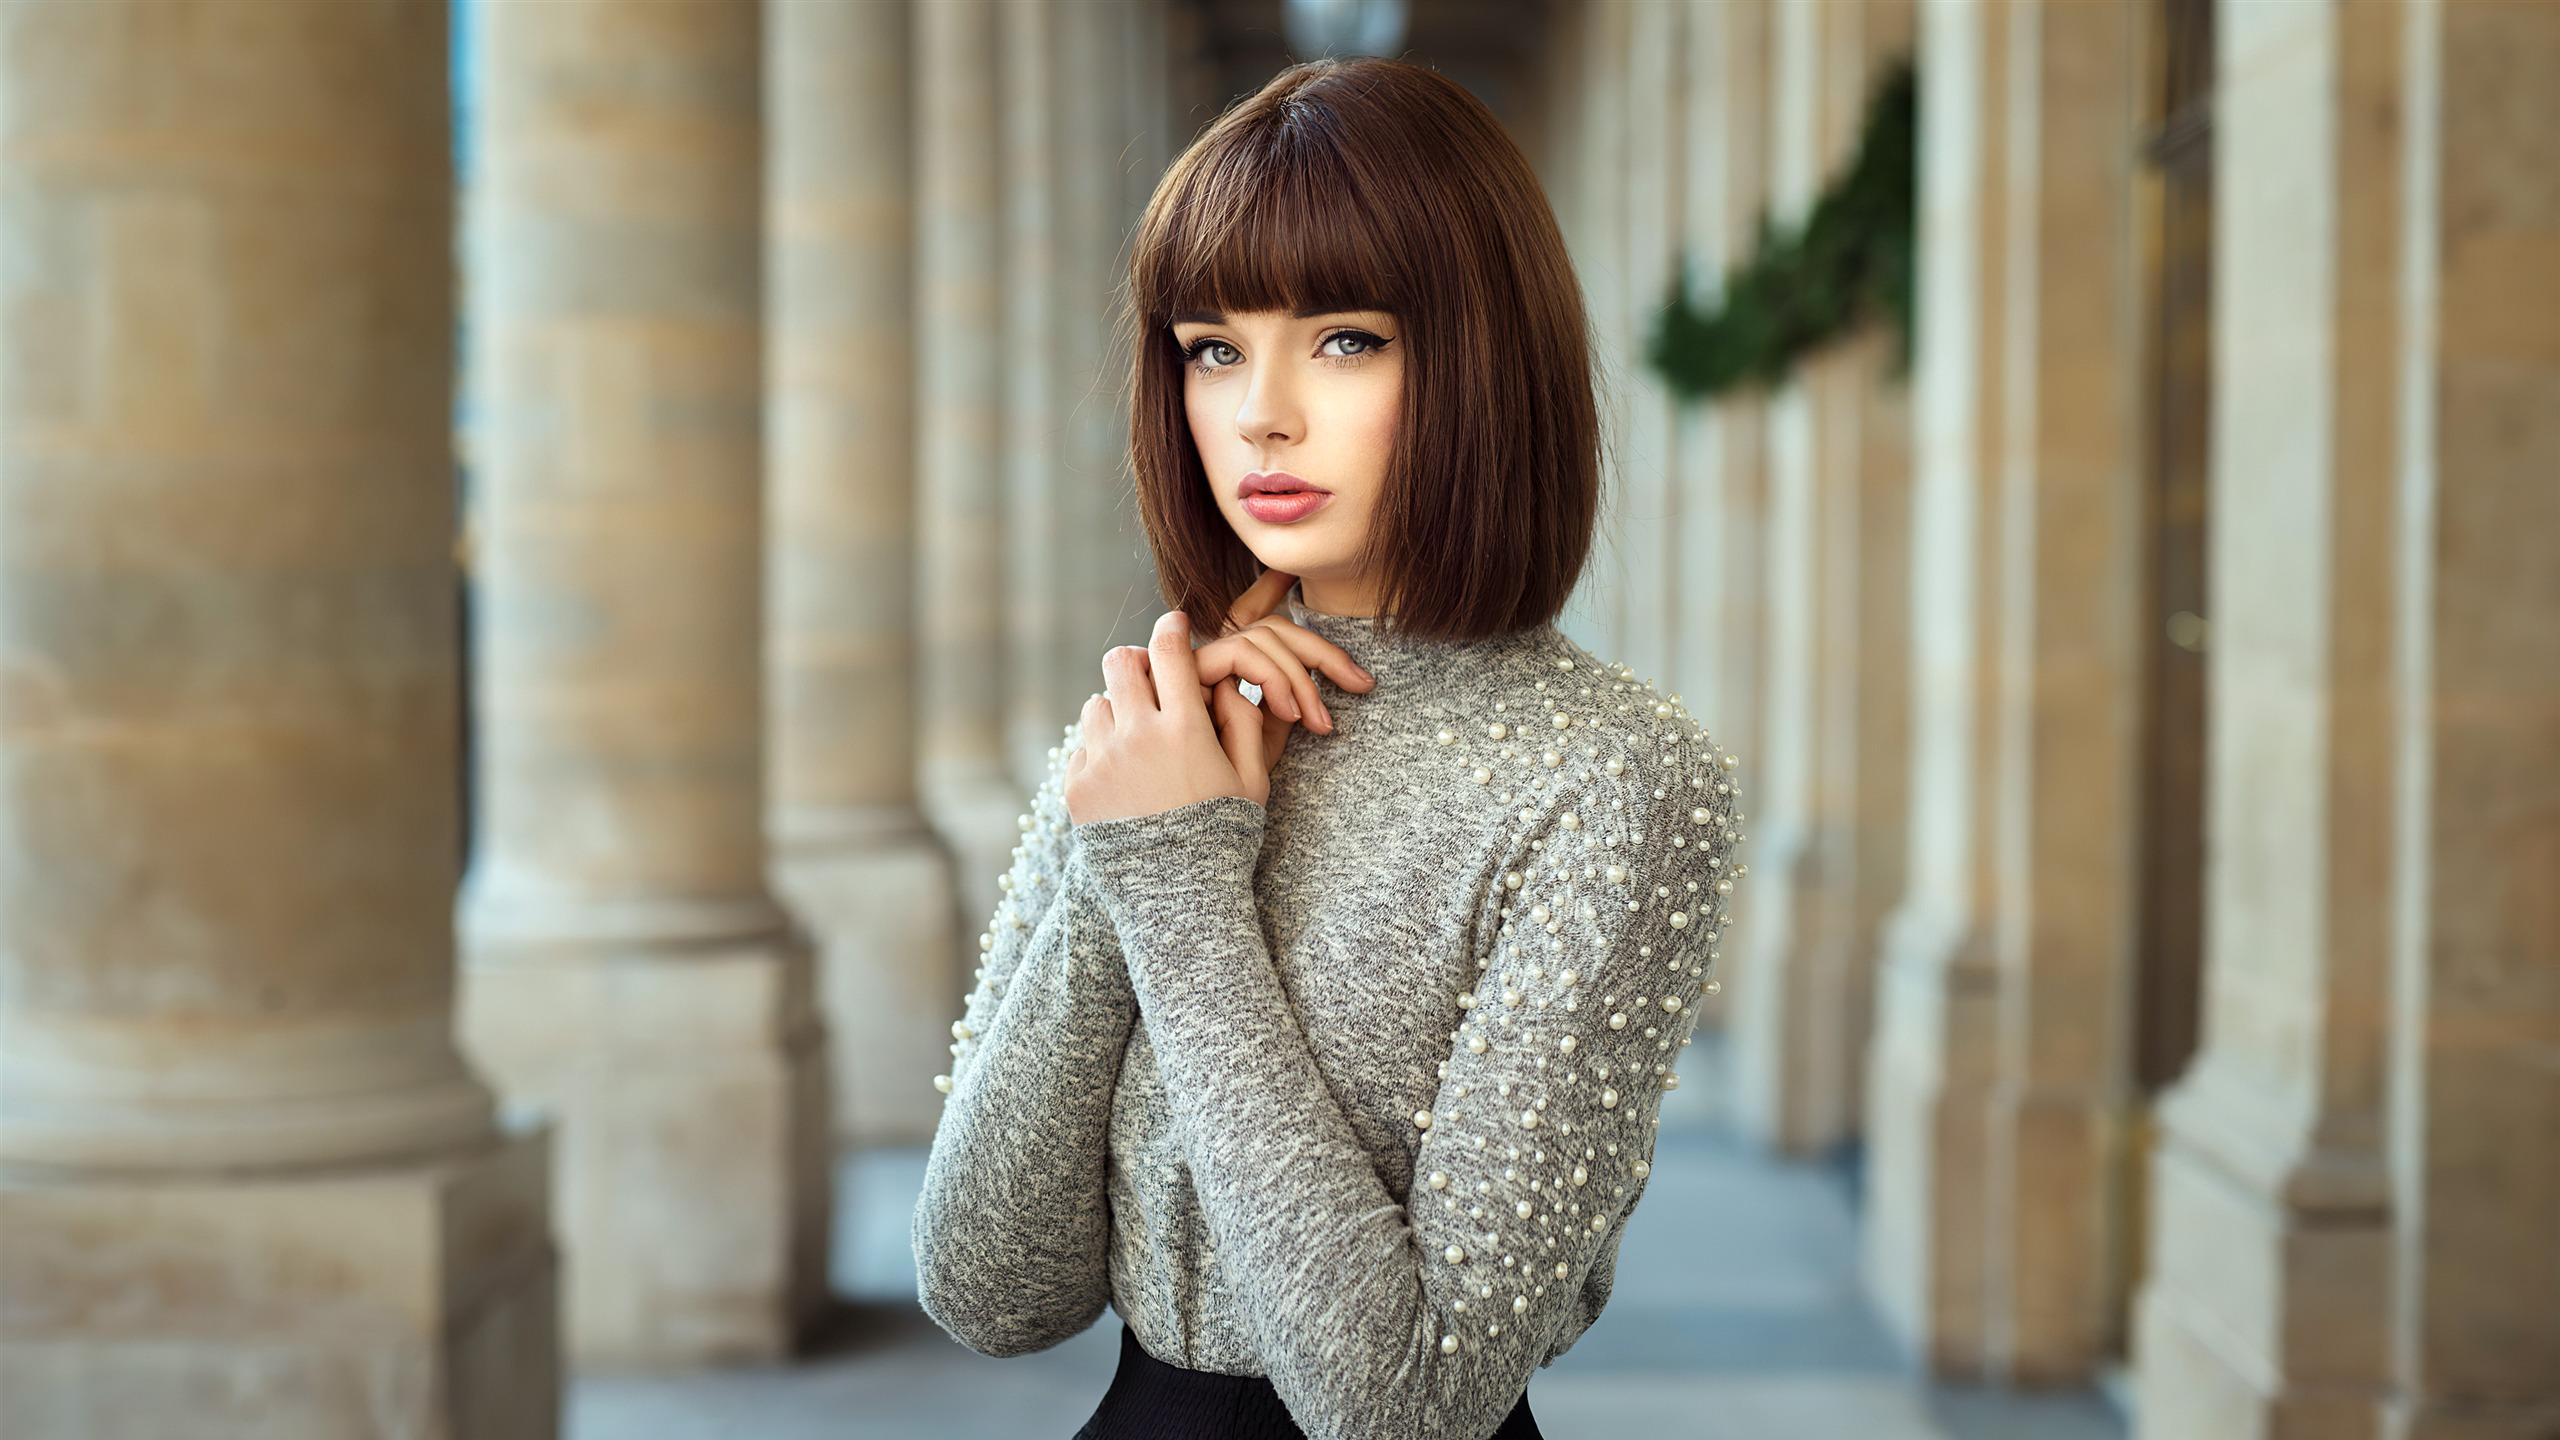 Short Hair Girl 2020 Fashion Model Hd Photo Preview